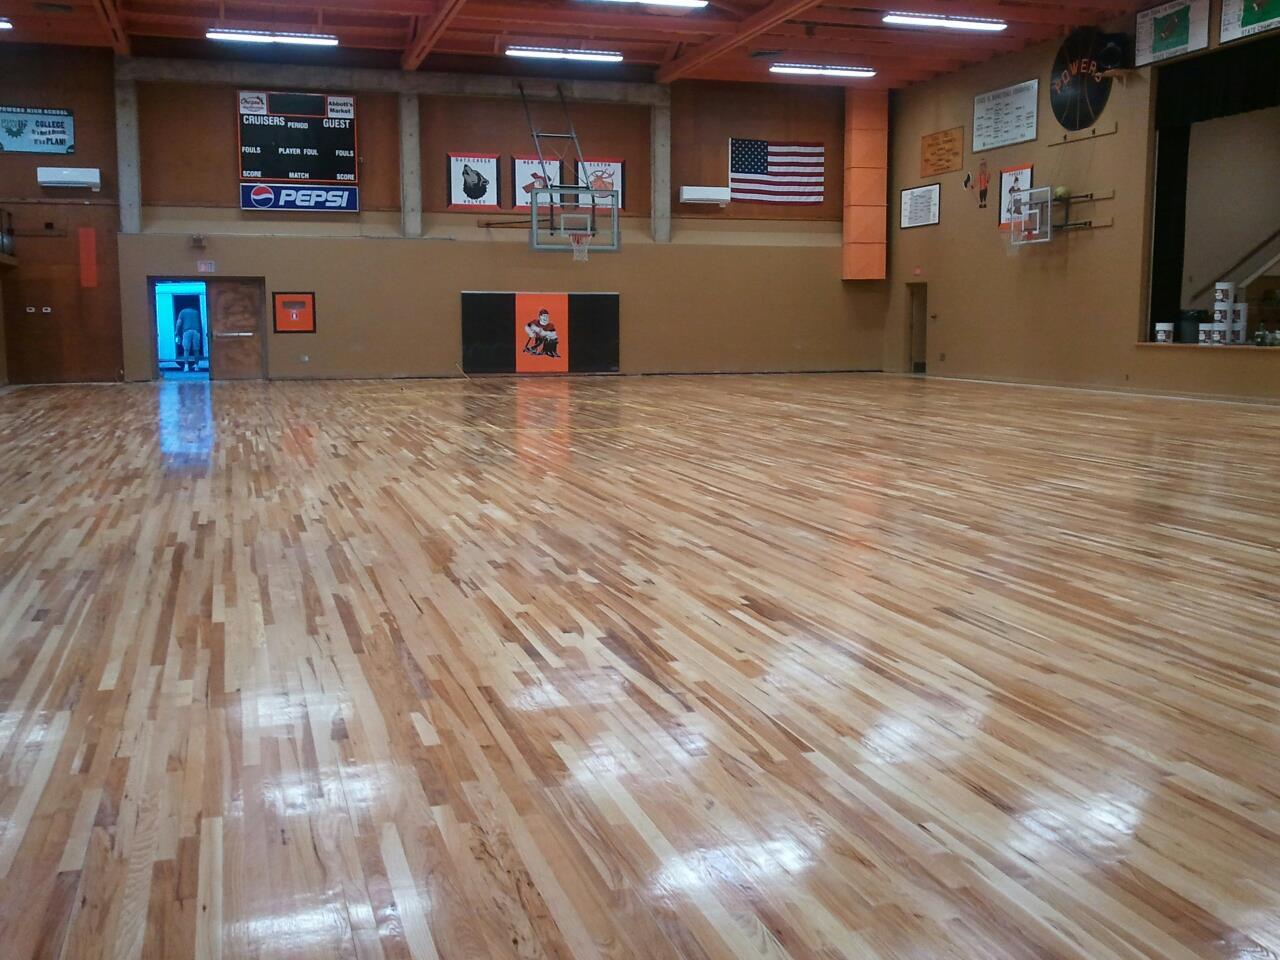 Shiny new floor for cruiser arena oregon hoops history for Oregon floor